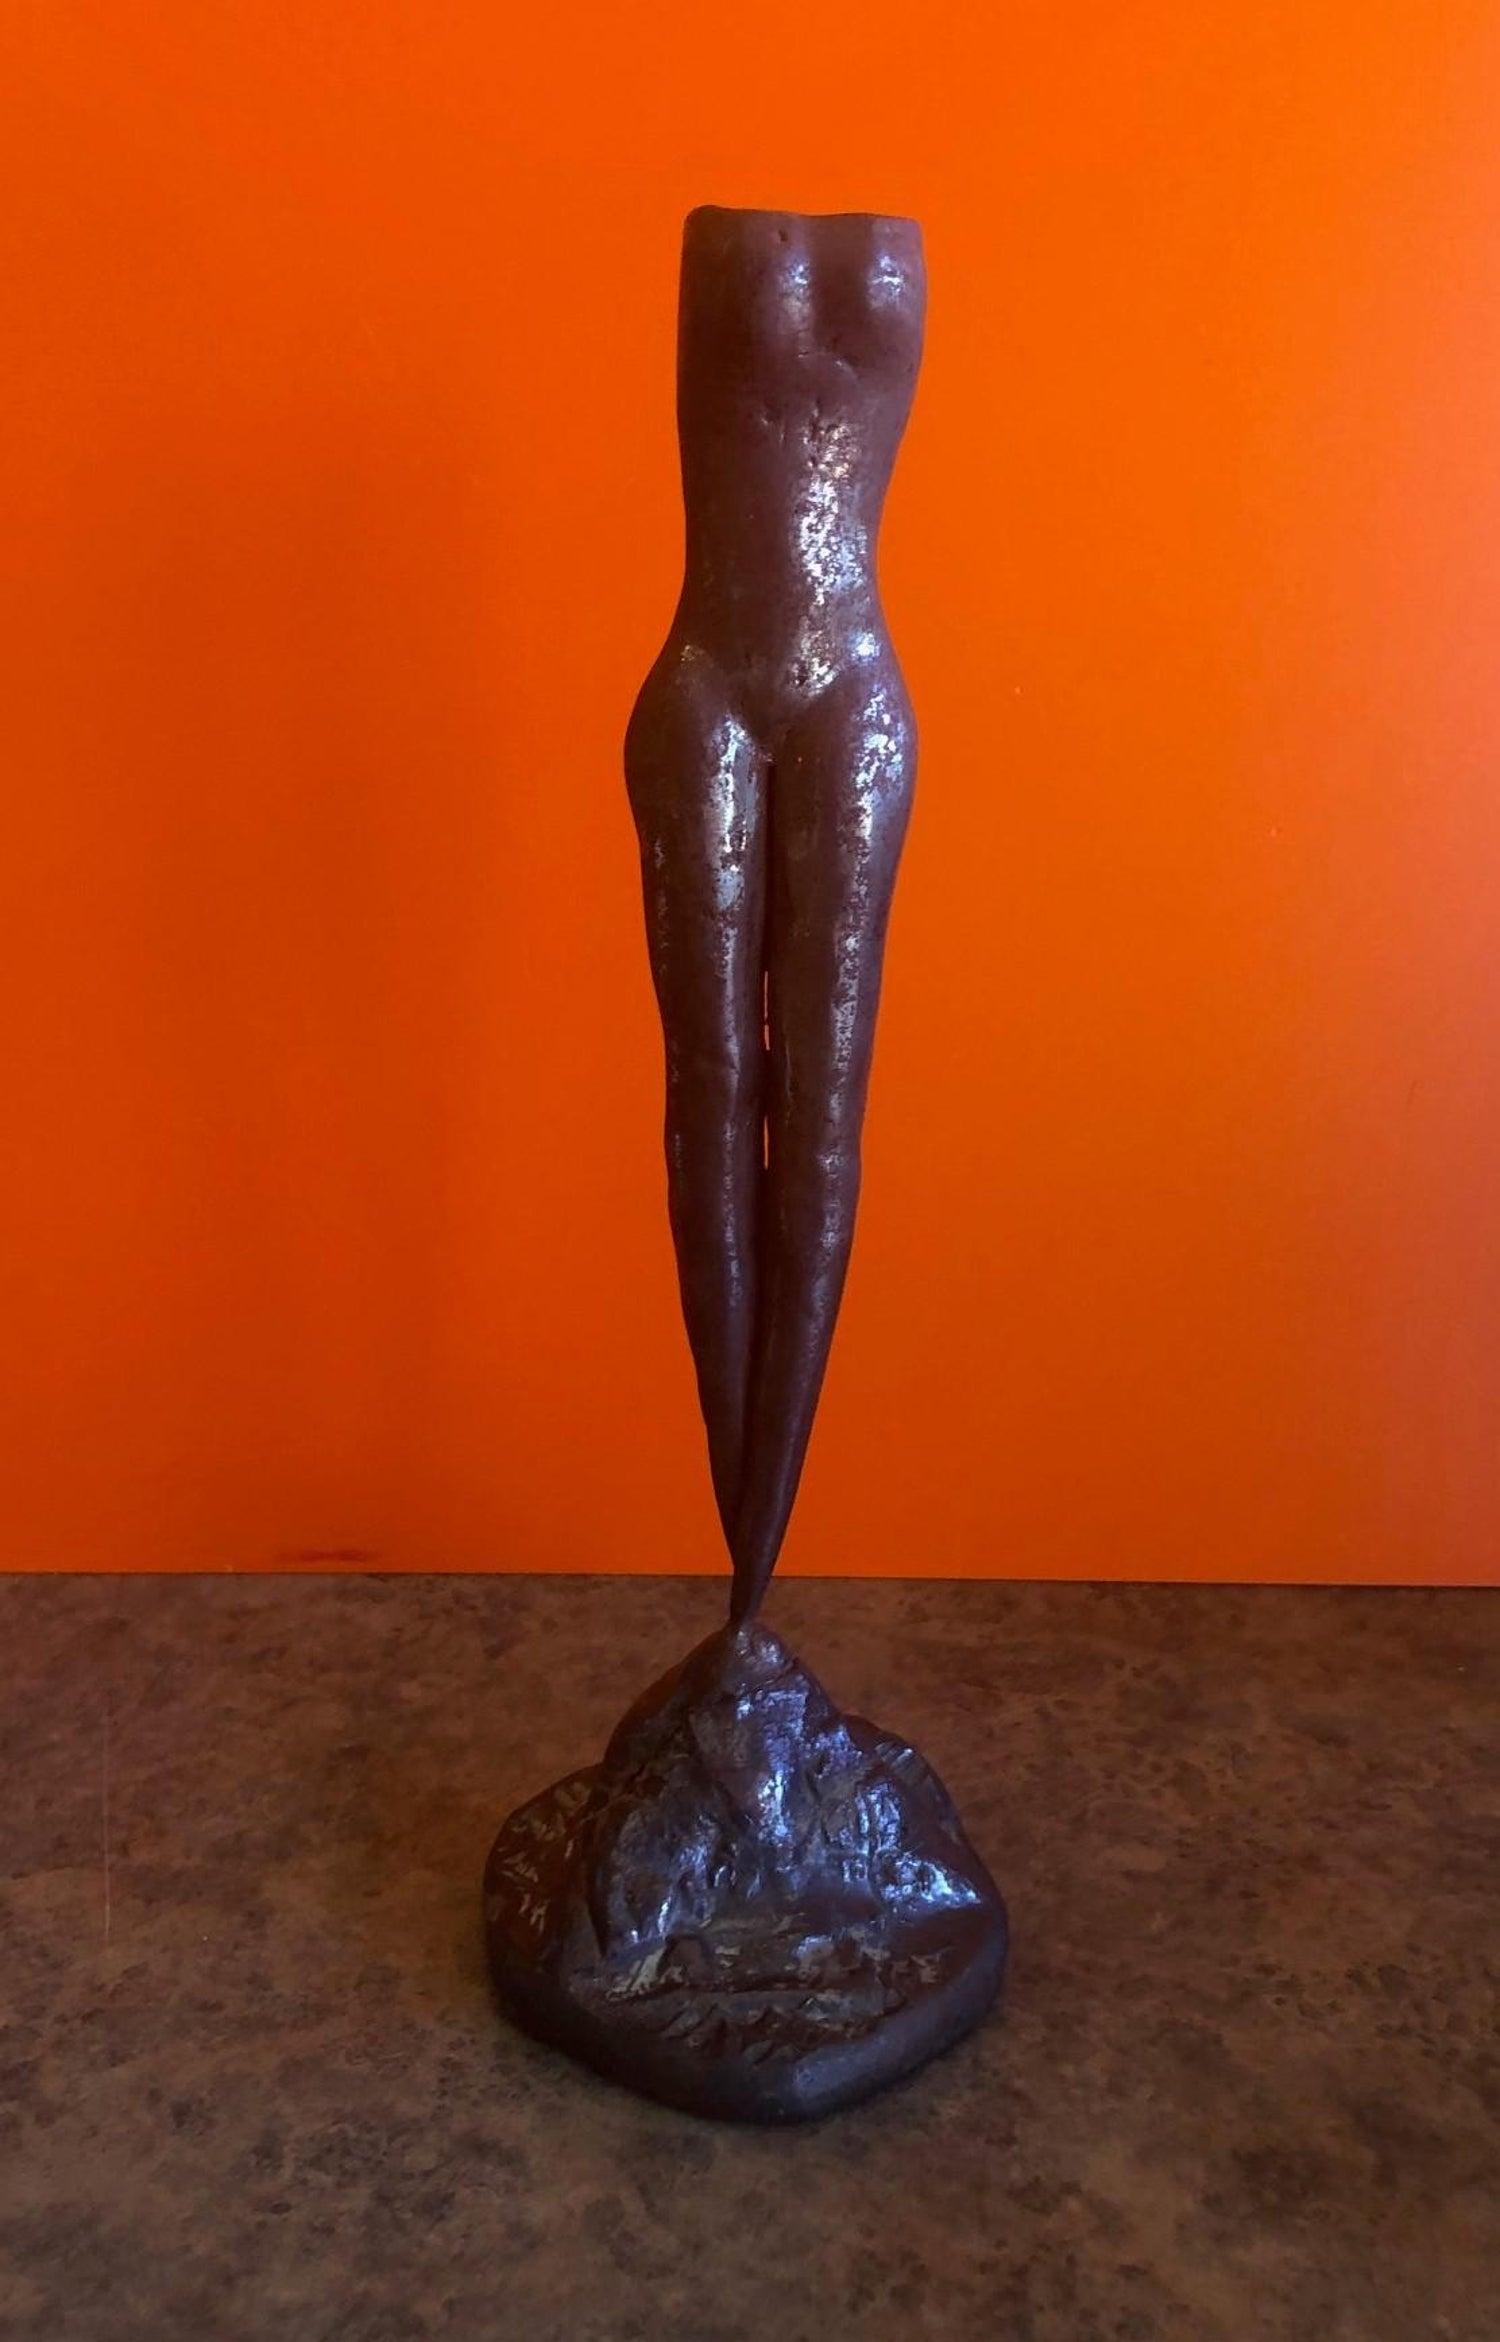 Angel Boris Nude bronze candlestick of a nude woman